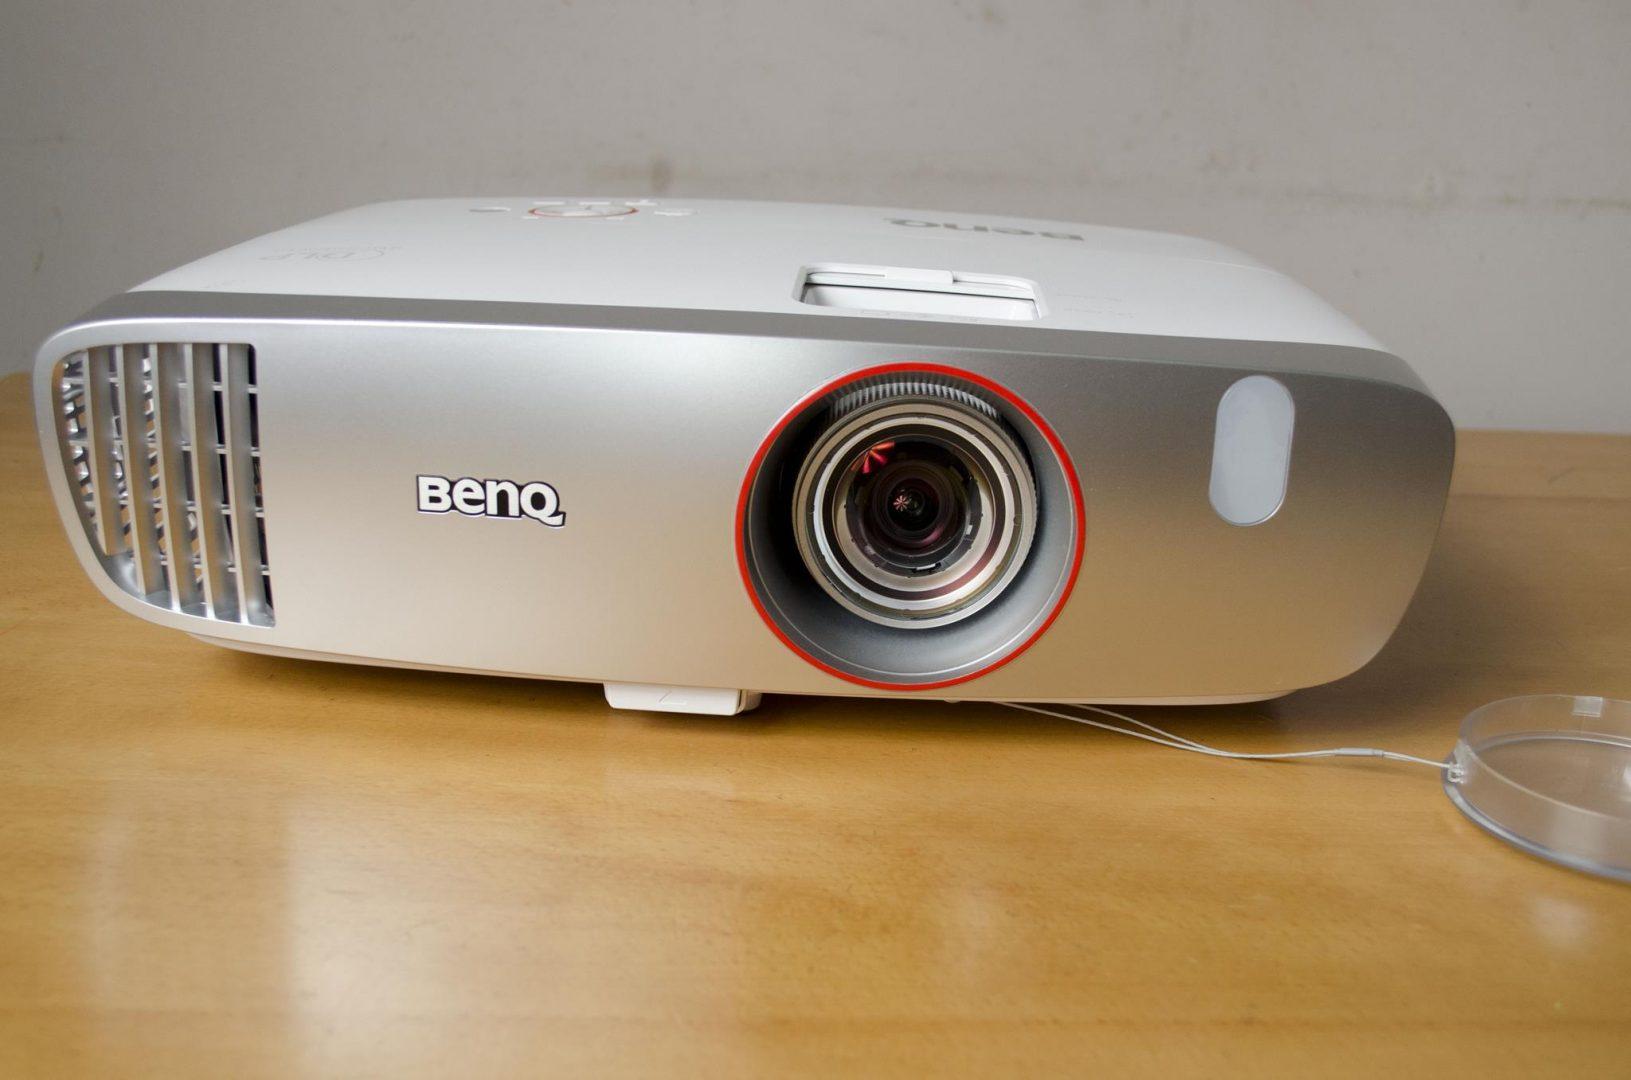 benq w1210st projector_6